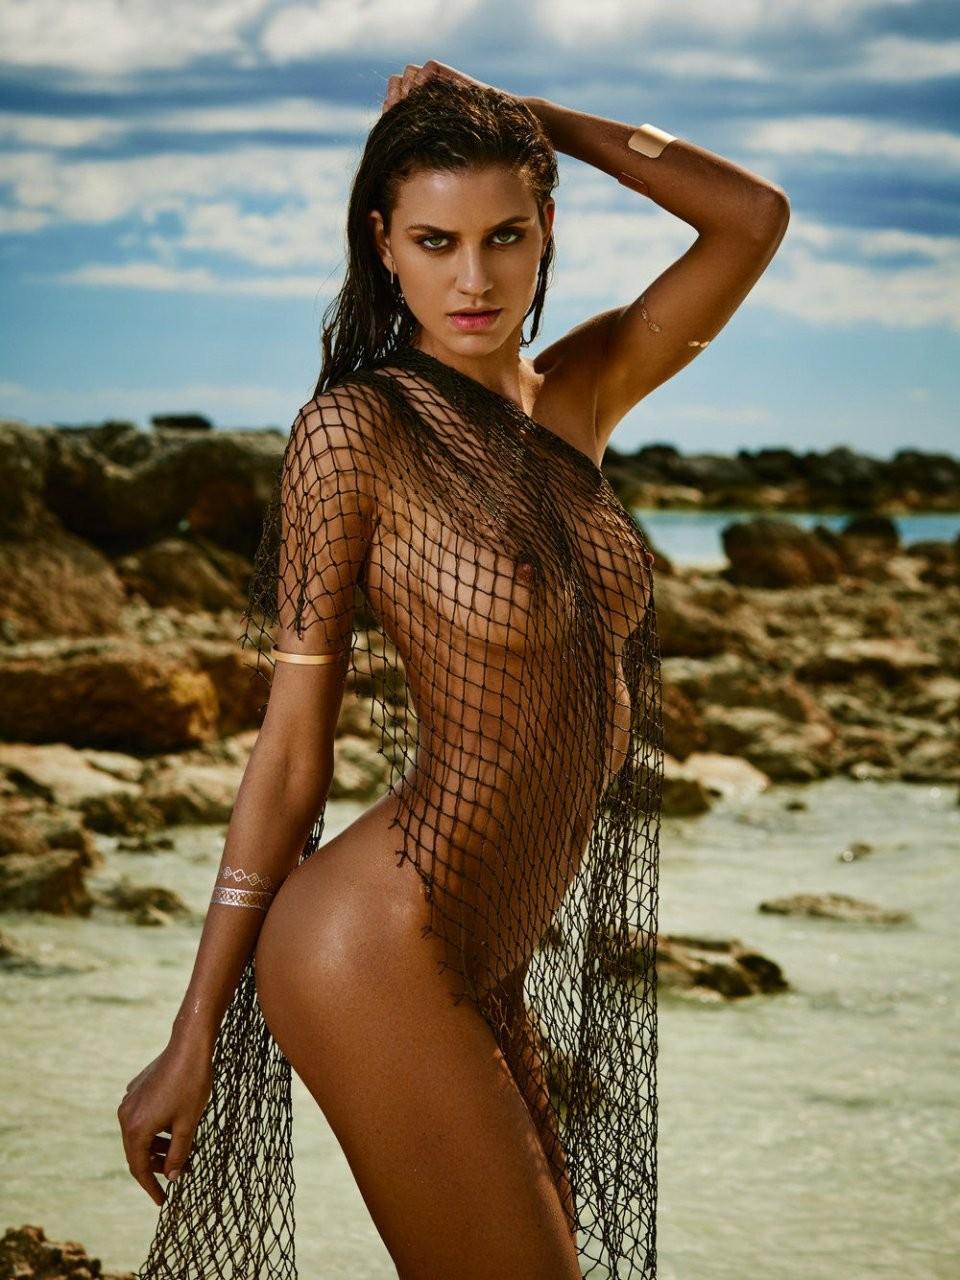 Rhobh Star Dorit Kemsley Ripped By Angry Woman During Bikini Romp